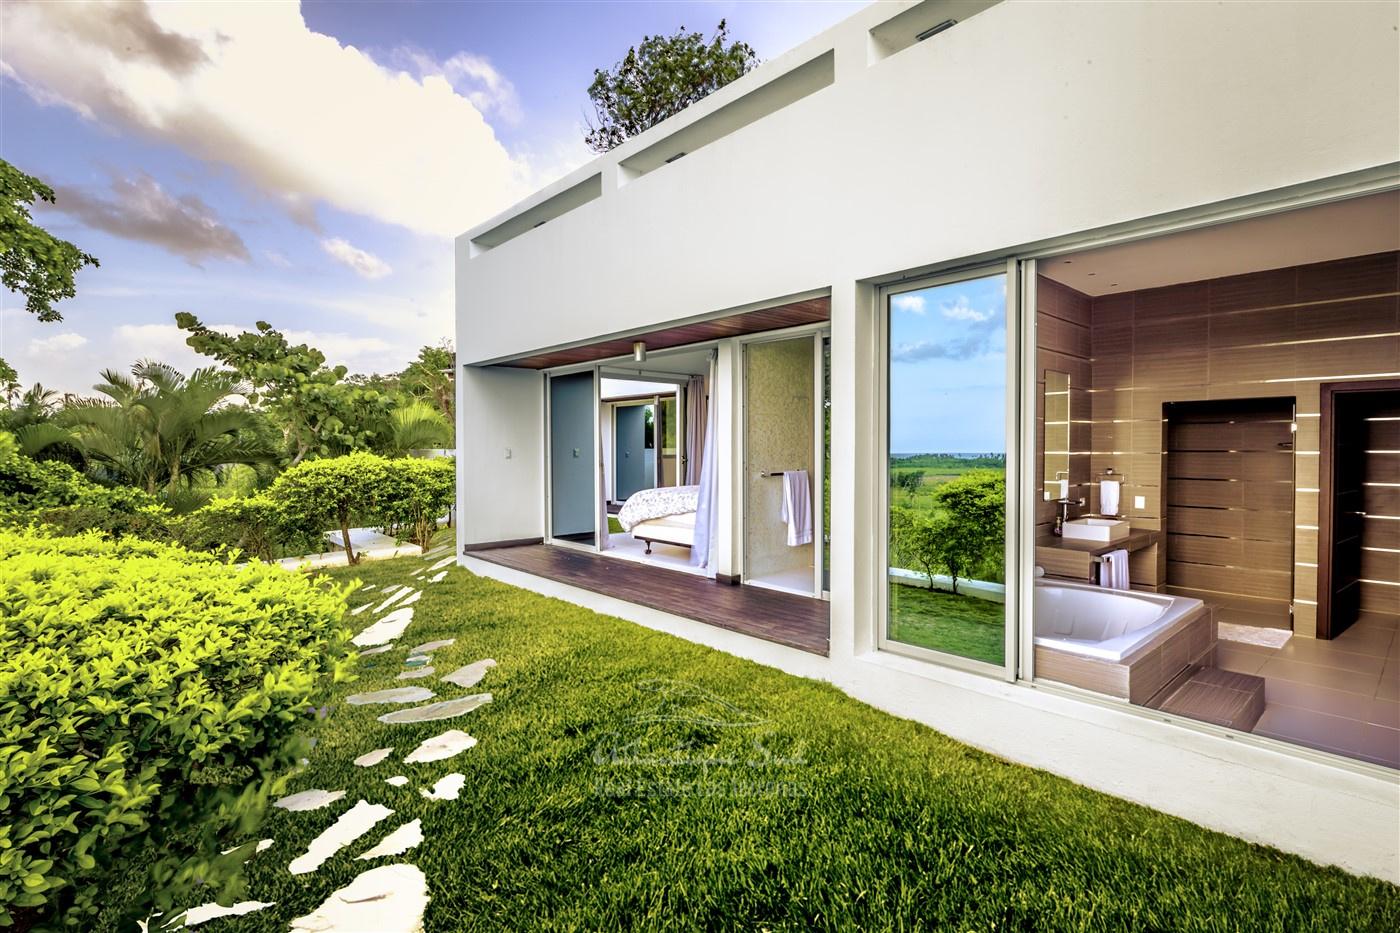 Modern Villa on a hill with ocean views Real Estate Las Terrenas Dominican Republic12.jpg